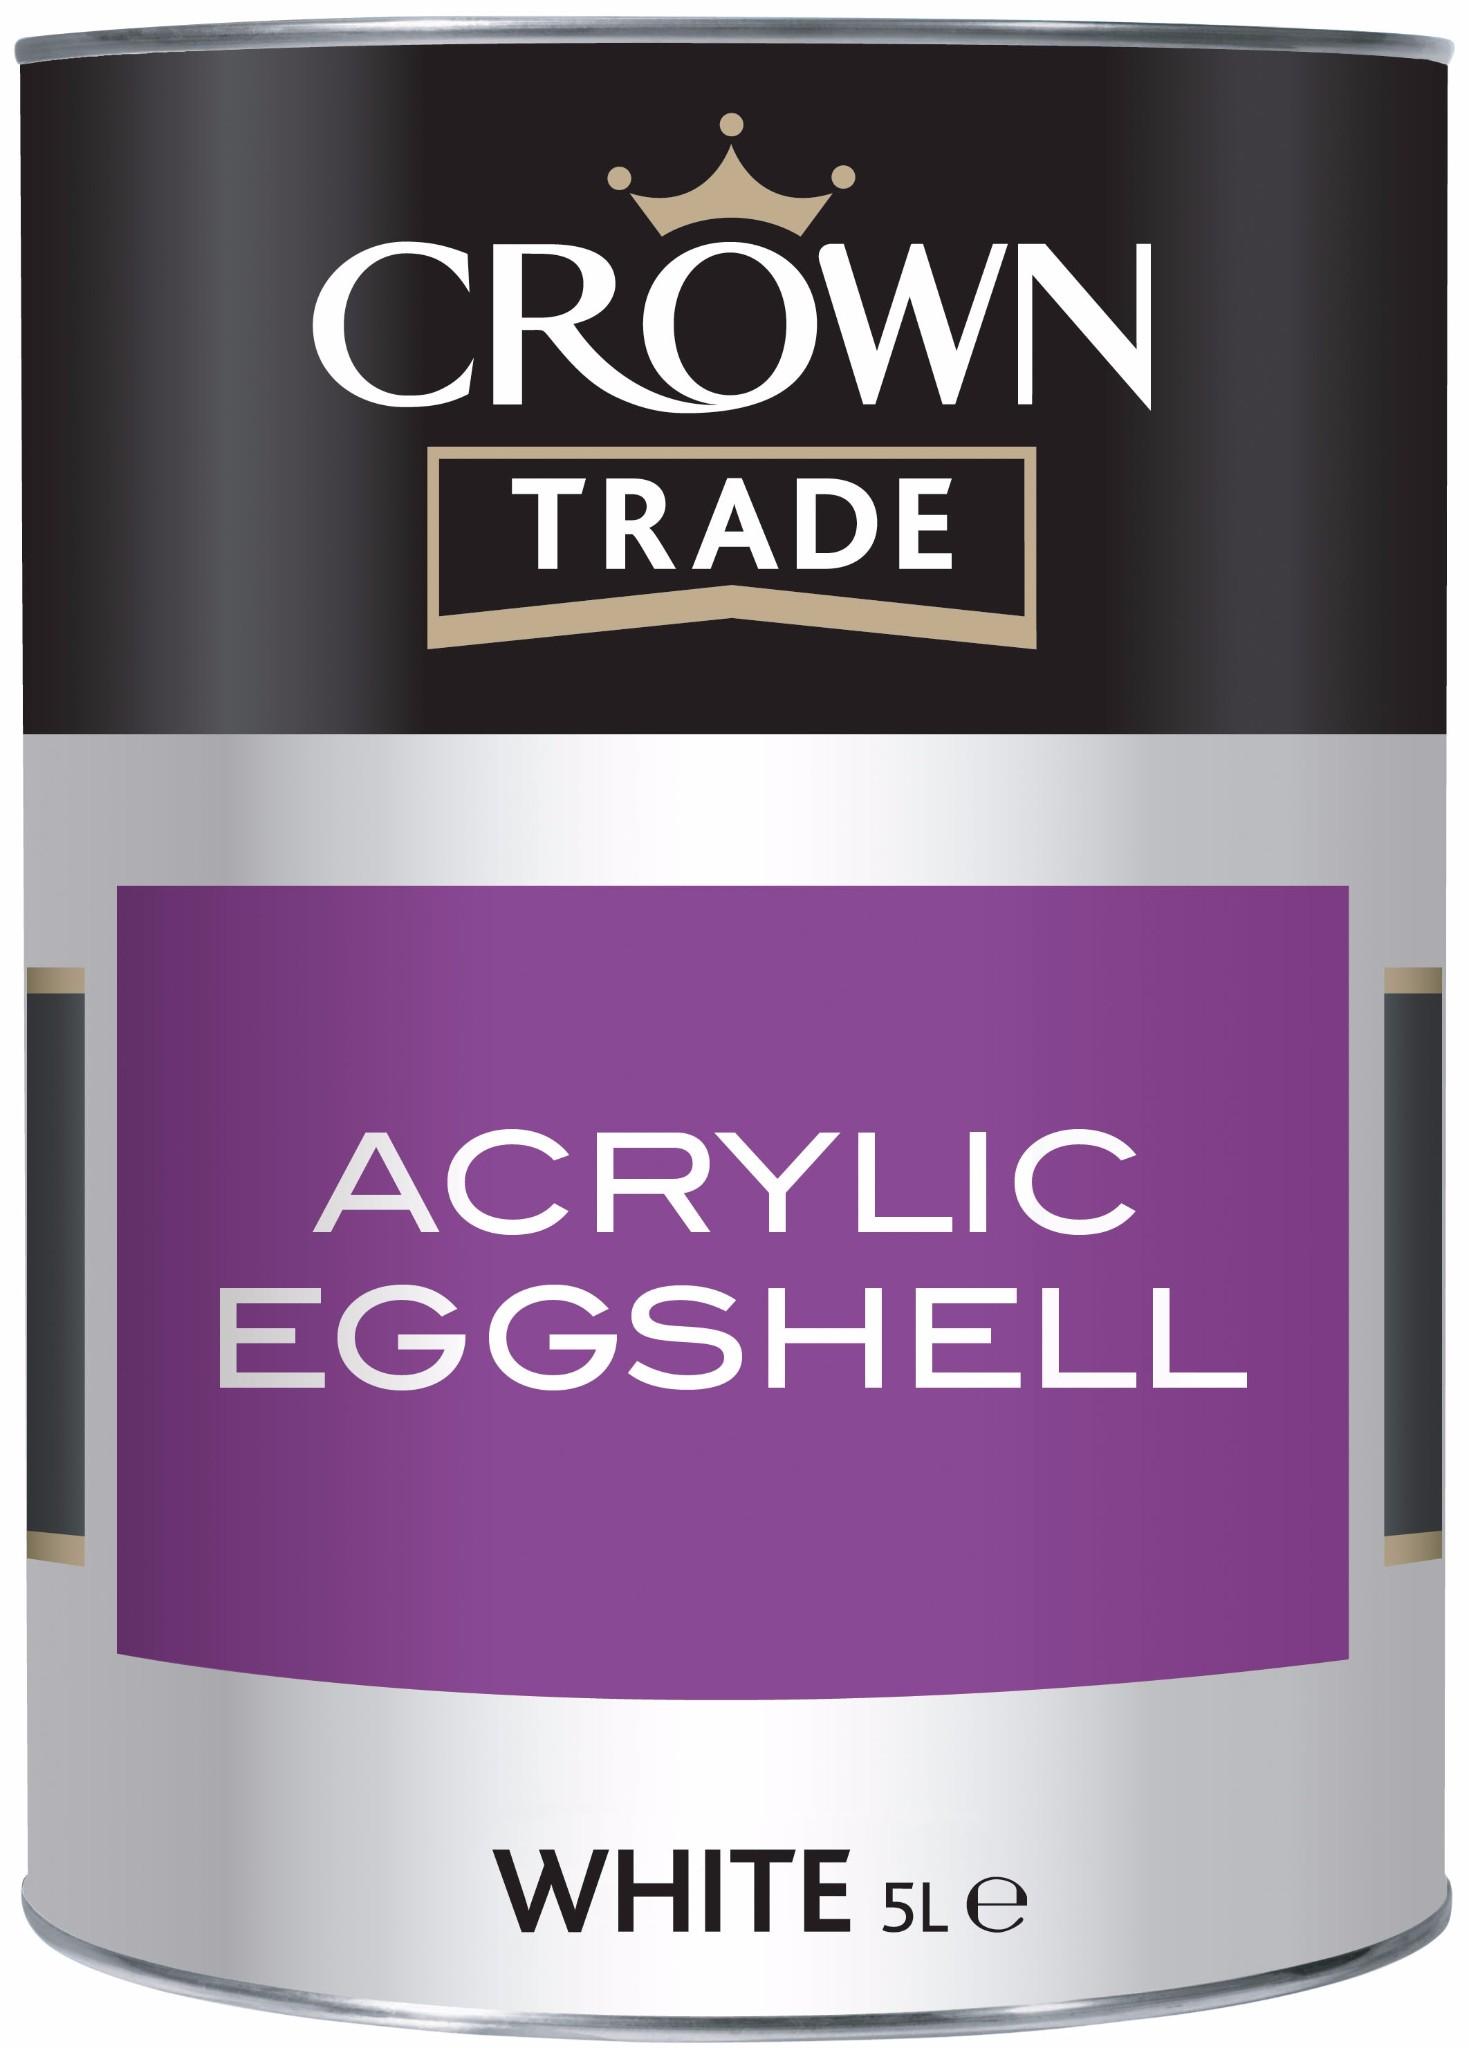 Crown Acrylic Eggshell